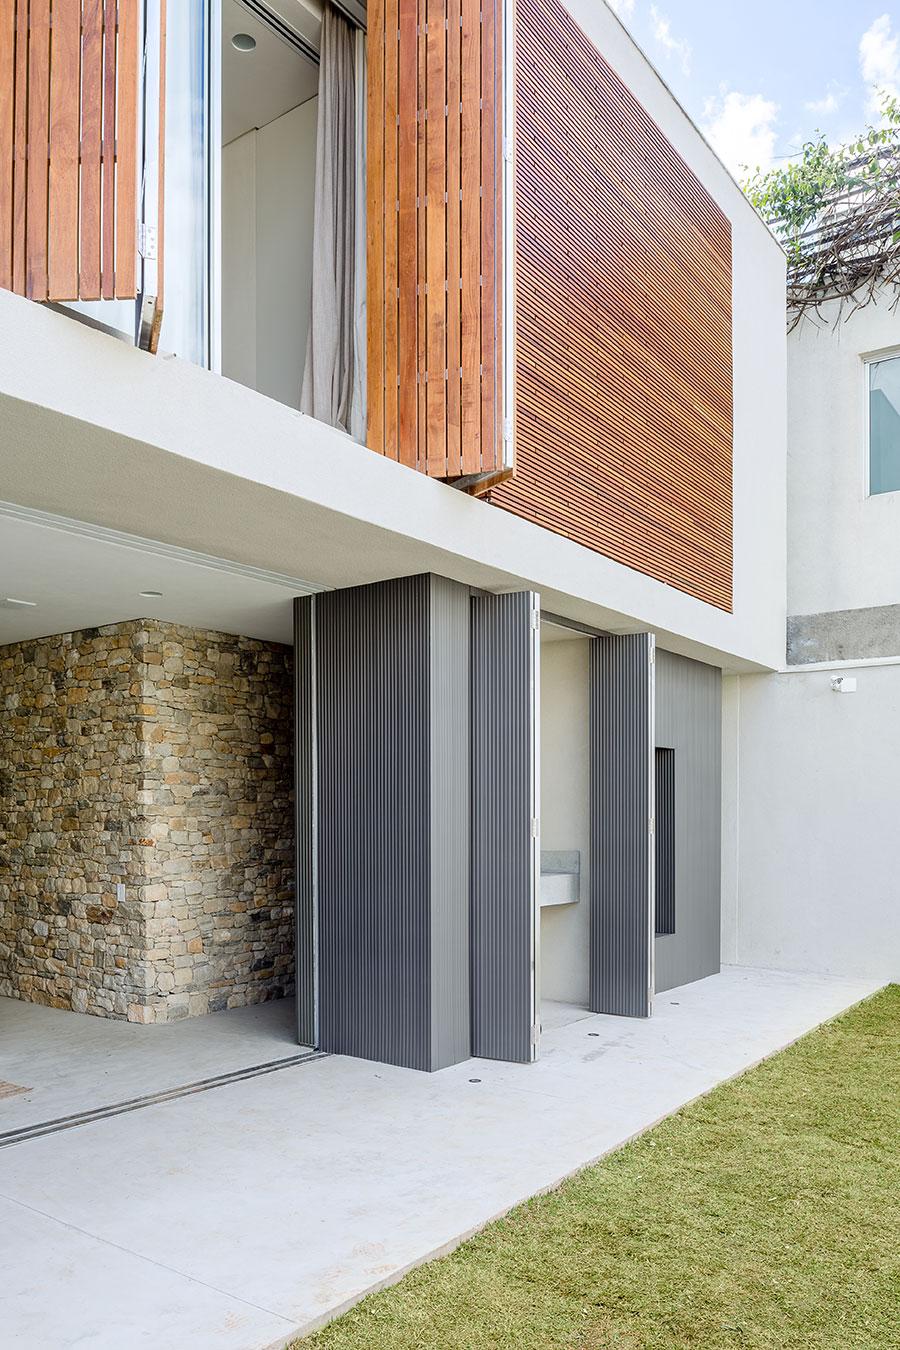 casa lara by felipe hess16 Lara House in Brasil by Felipe Hess